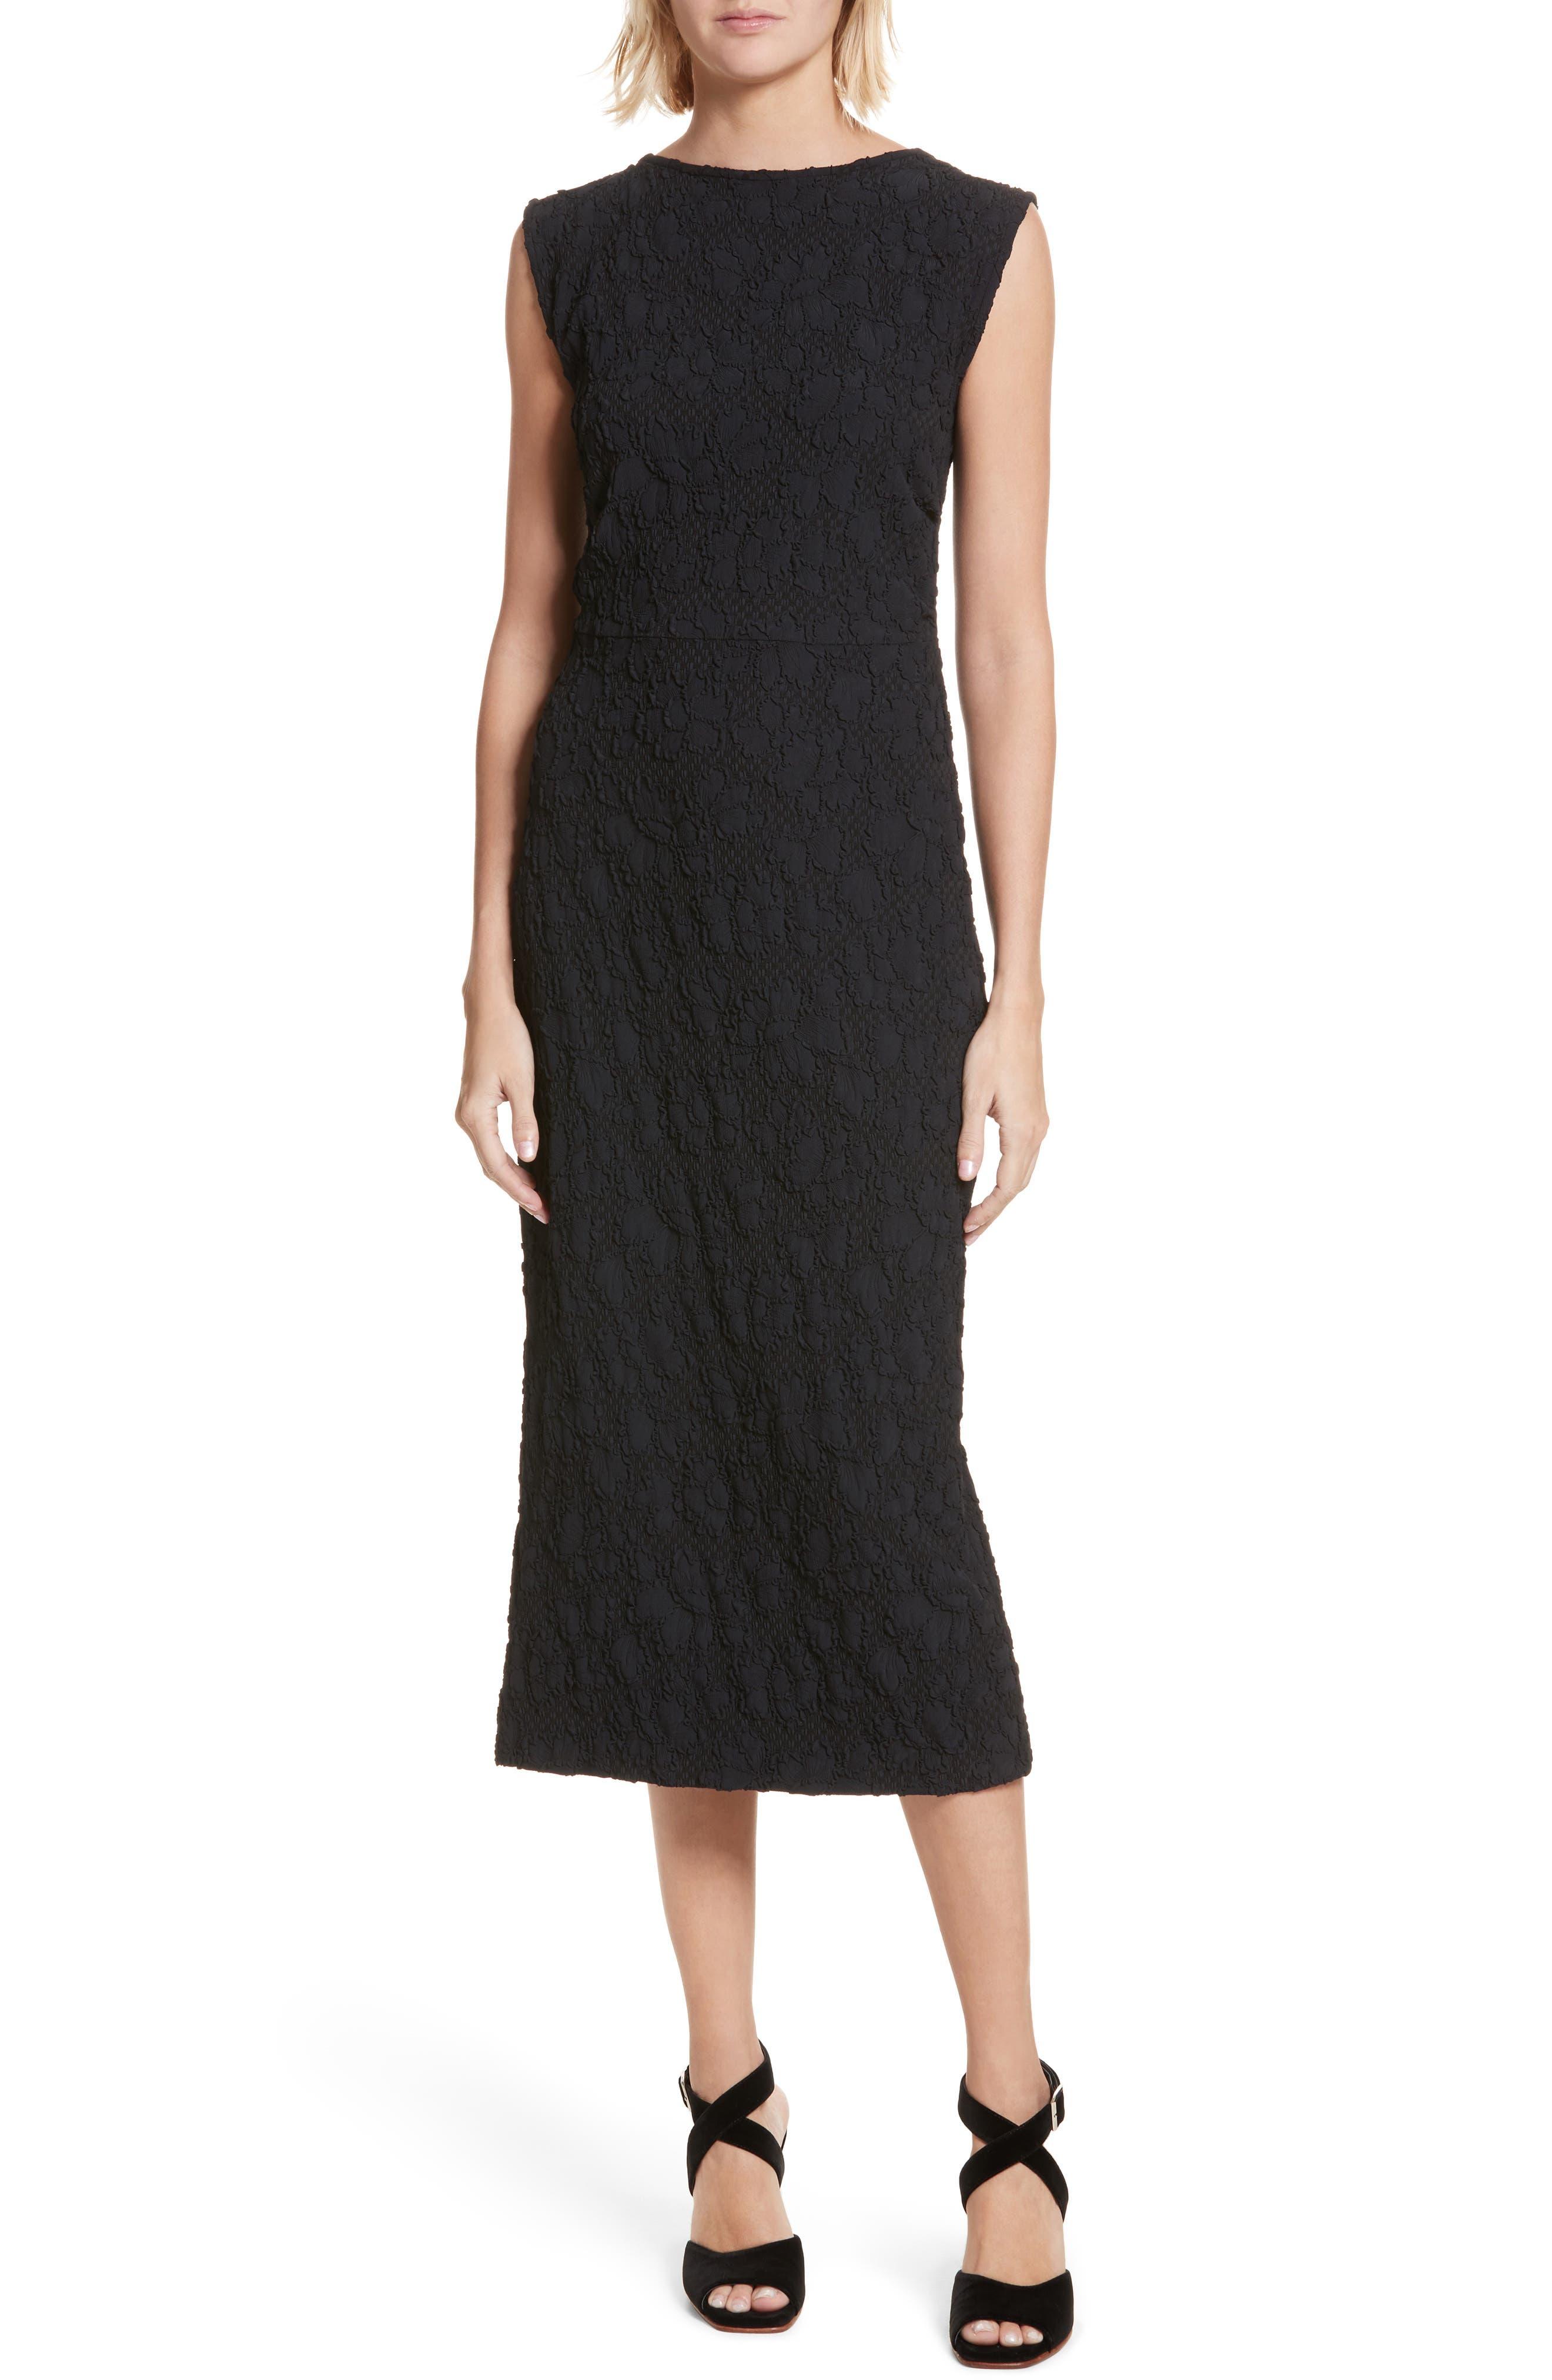 Alternate Image 1 Selected - Rachel Comey Medina Floral Jacquard Sheath Dress